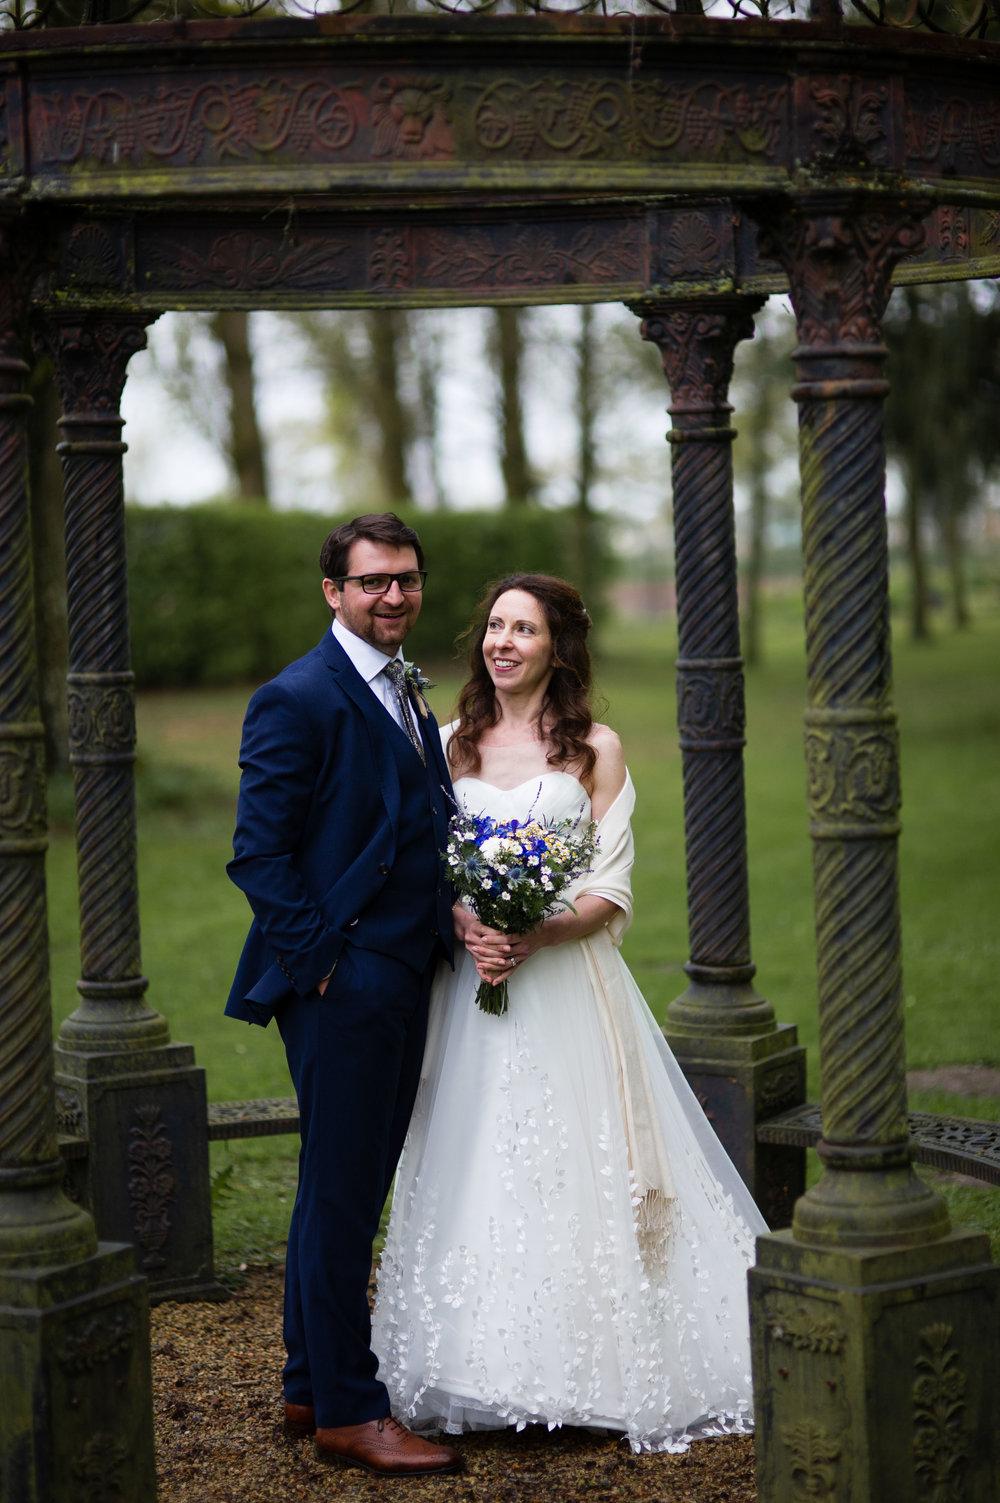 Beechfield house weddings - Abby and Greg (191 of 208).jpg